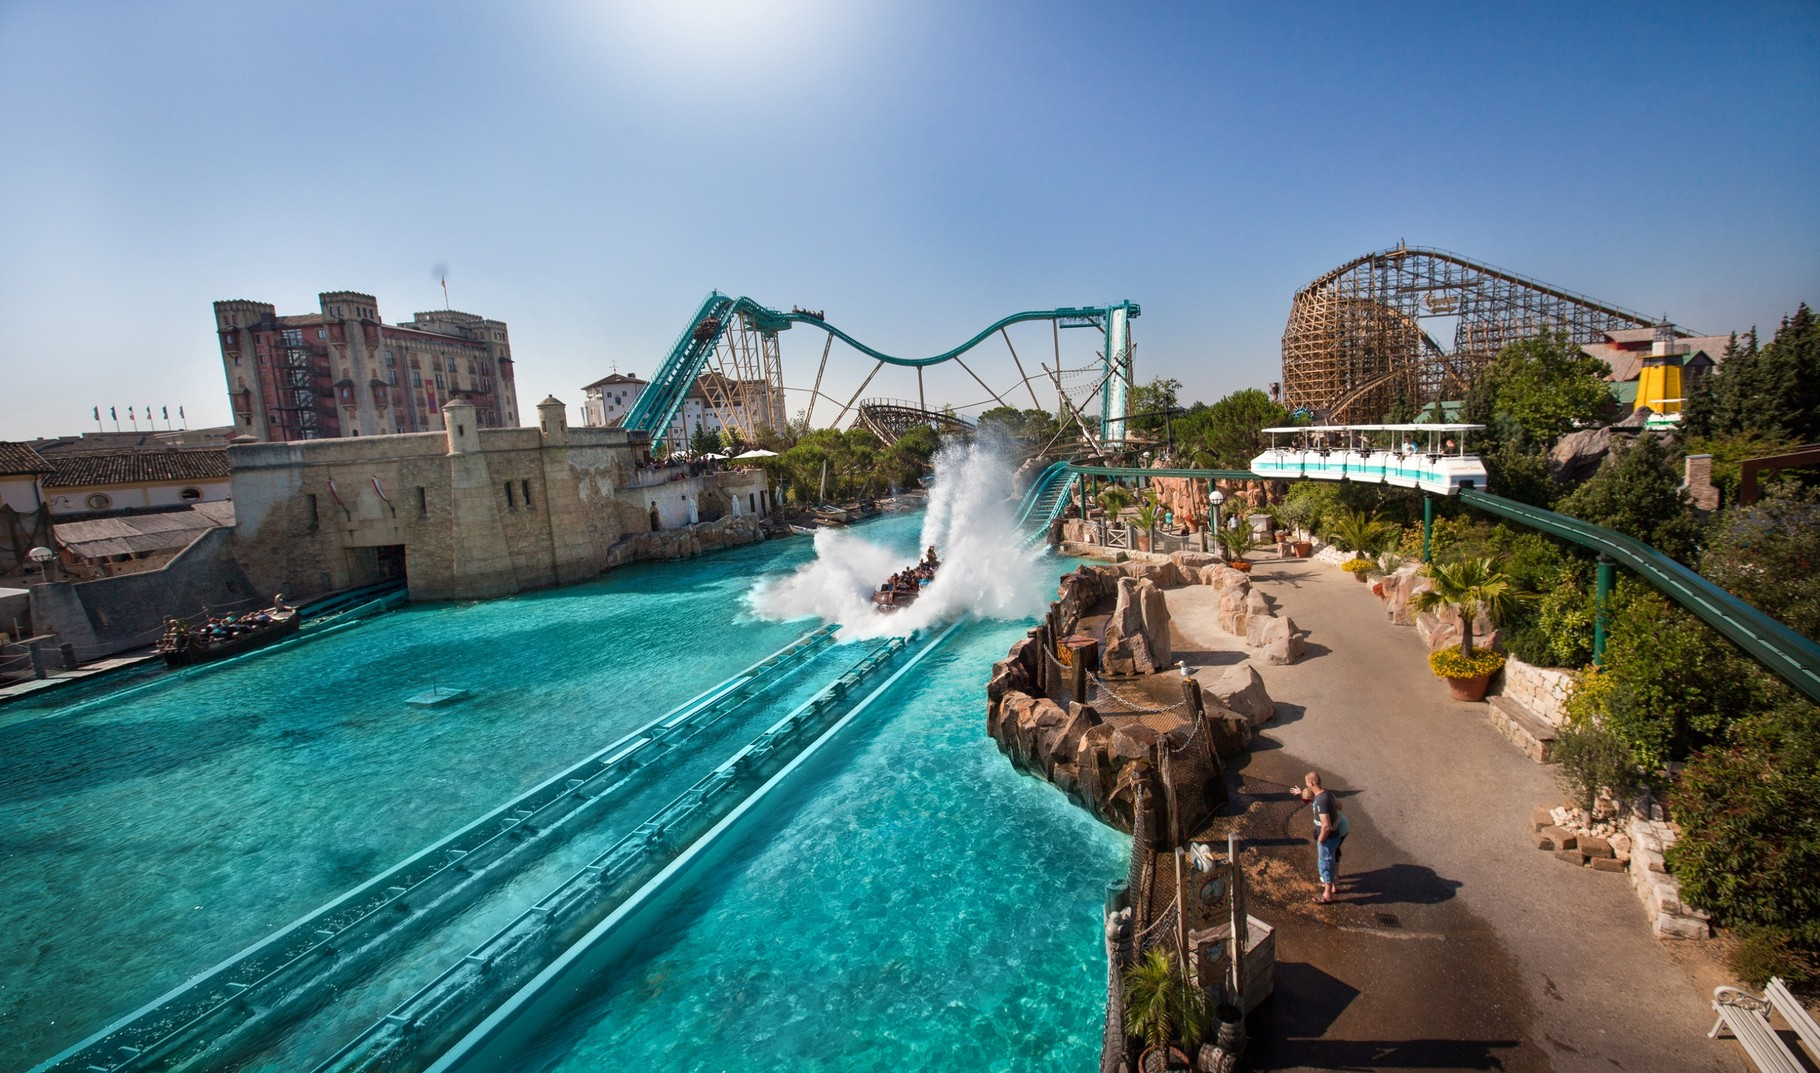 Atlantica Super Splash at Europa-Park, let the water flow!